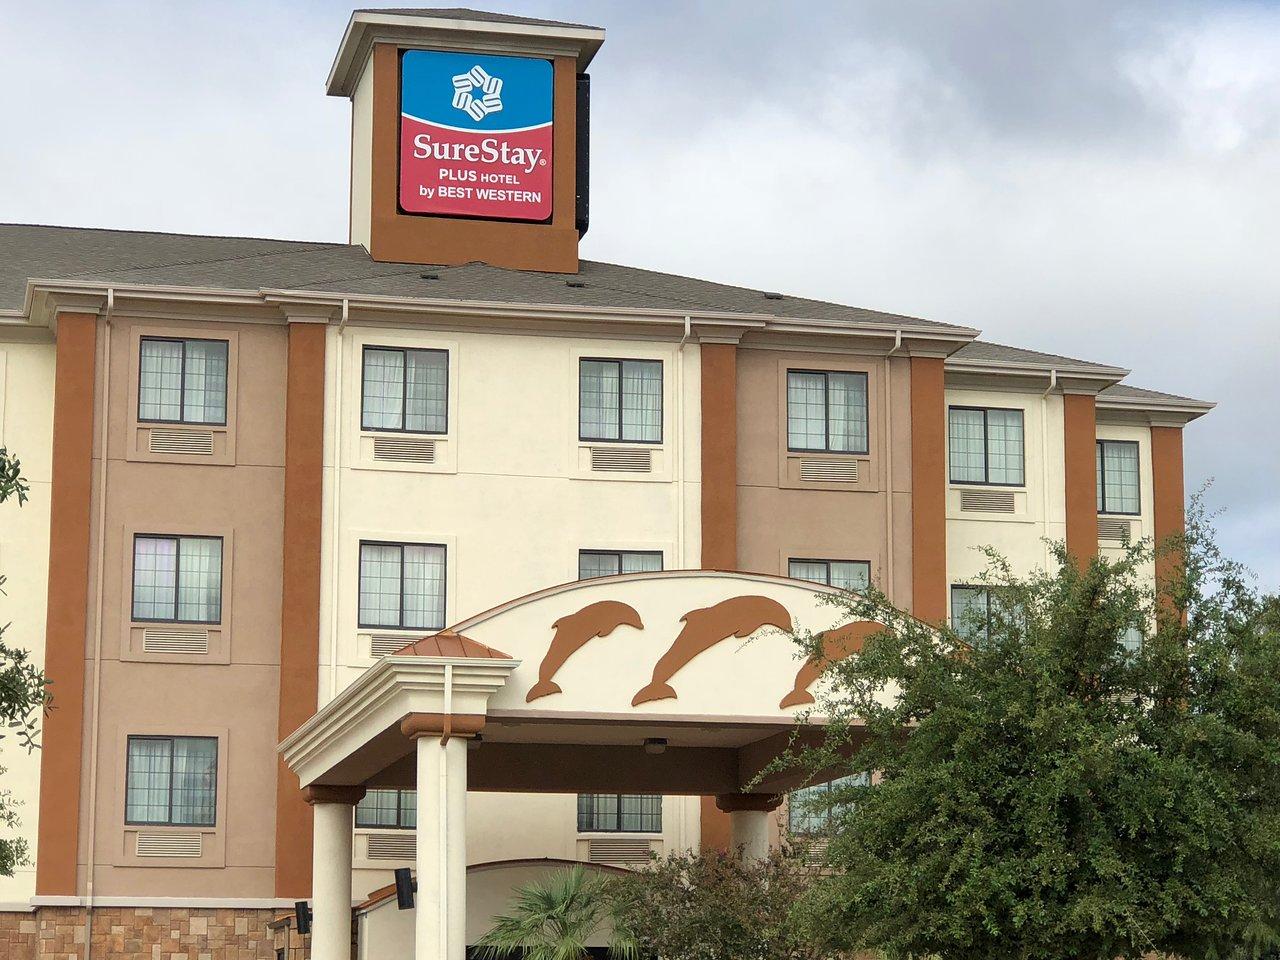 Surestay Plus Hotel By Best Western San Antonio Seaworld 72 8 9 Updated 2018 Prices Reviews Tx Tripadvisor